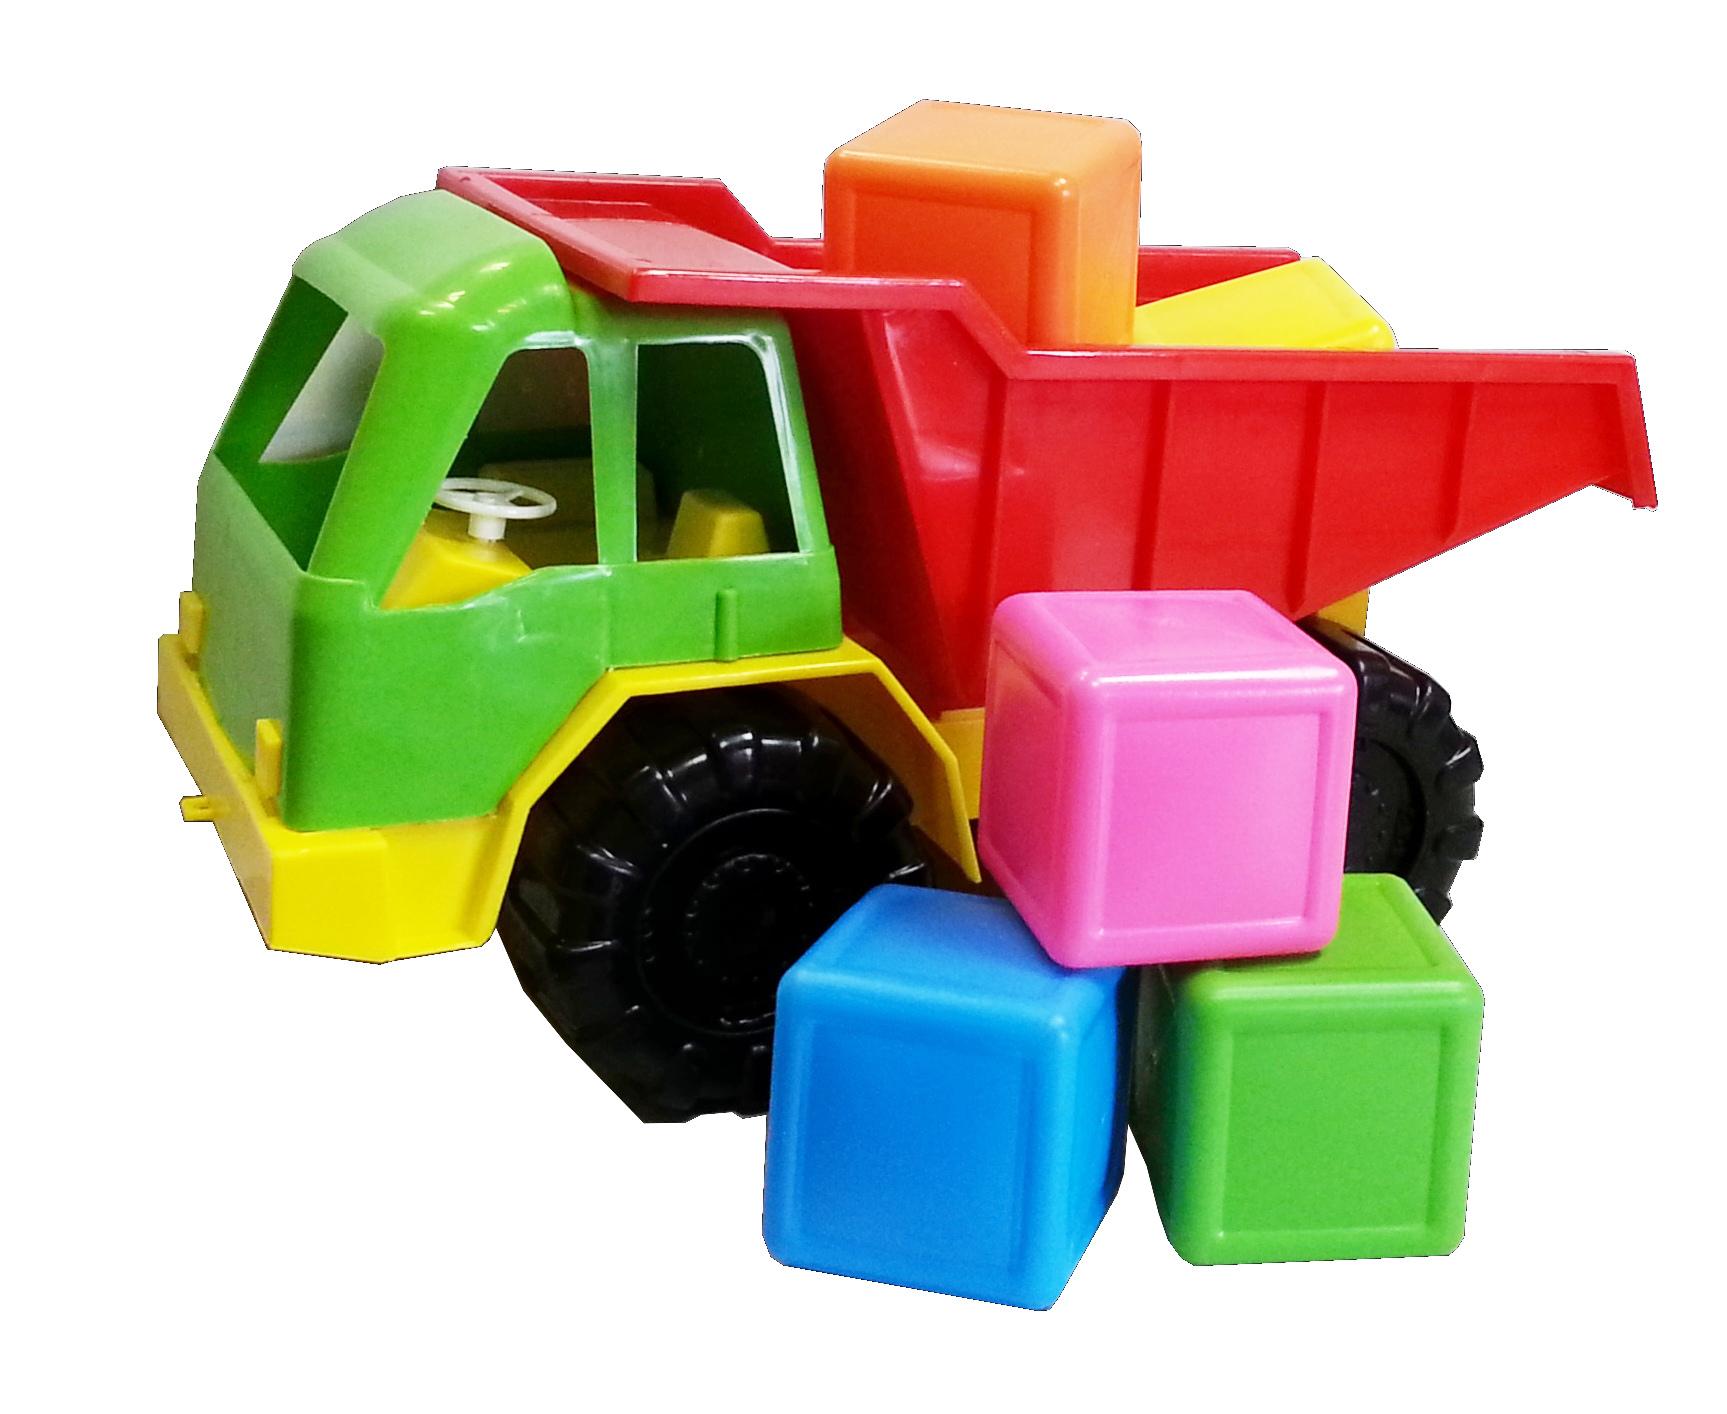 3-282 Грузовик + кубики